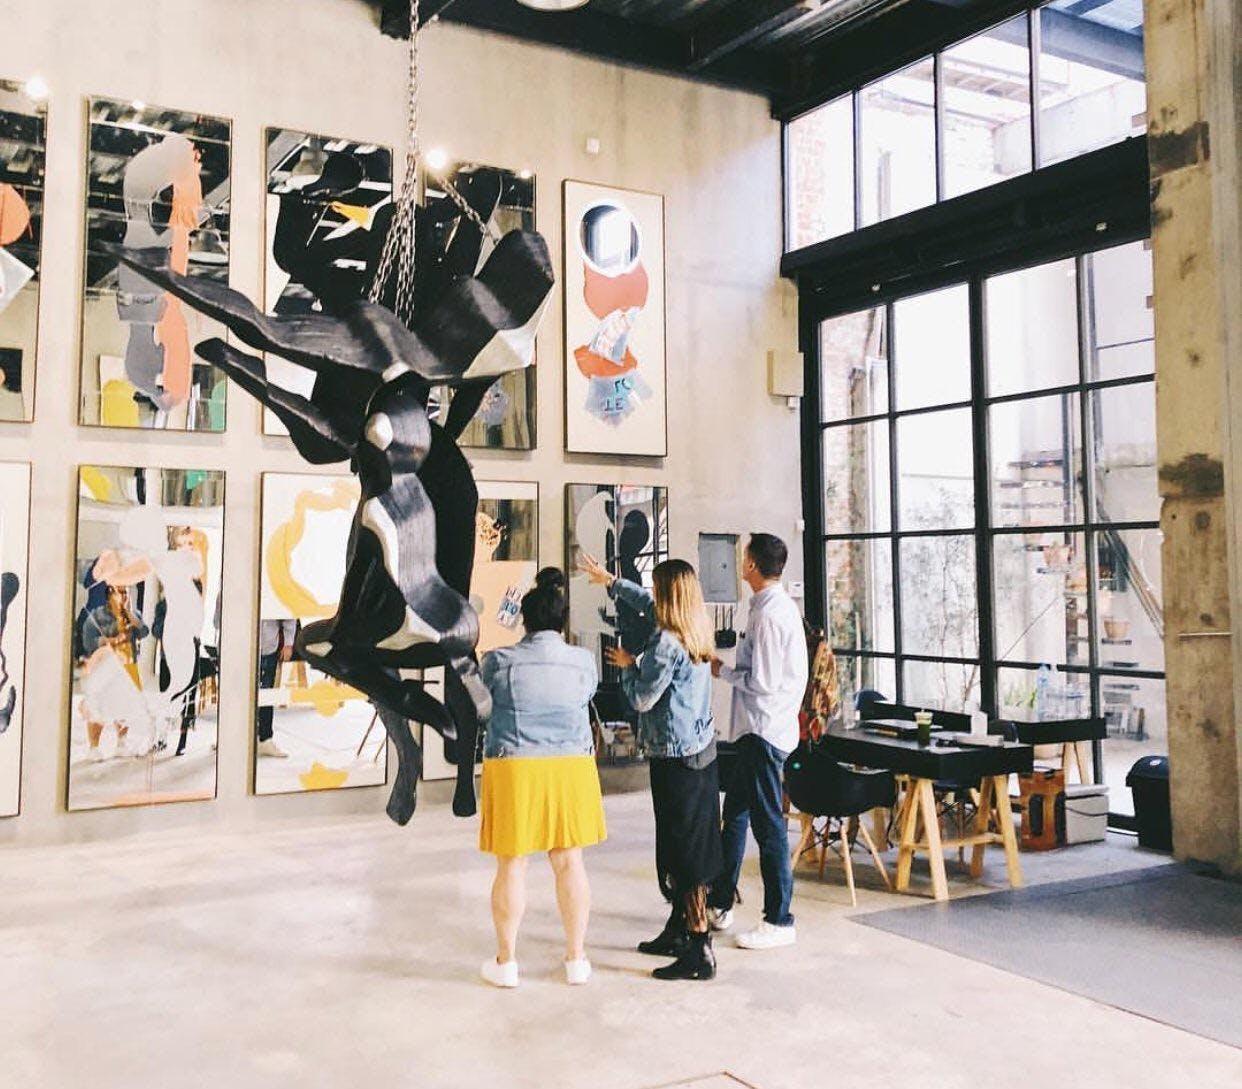 Exploring Art Galleries in Mexico City